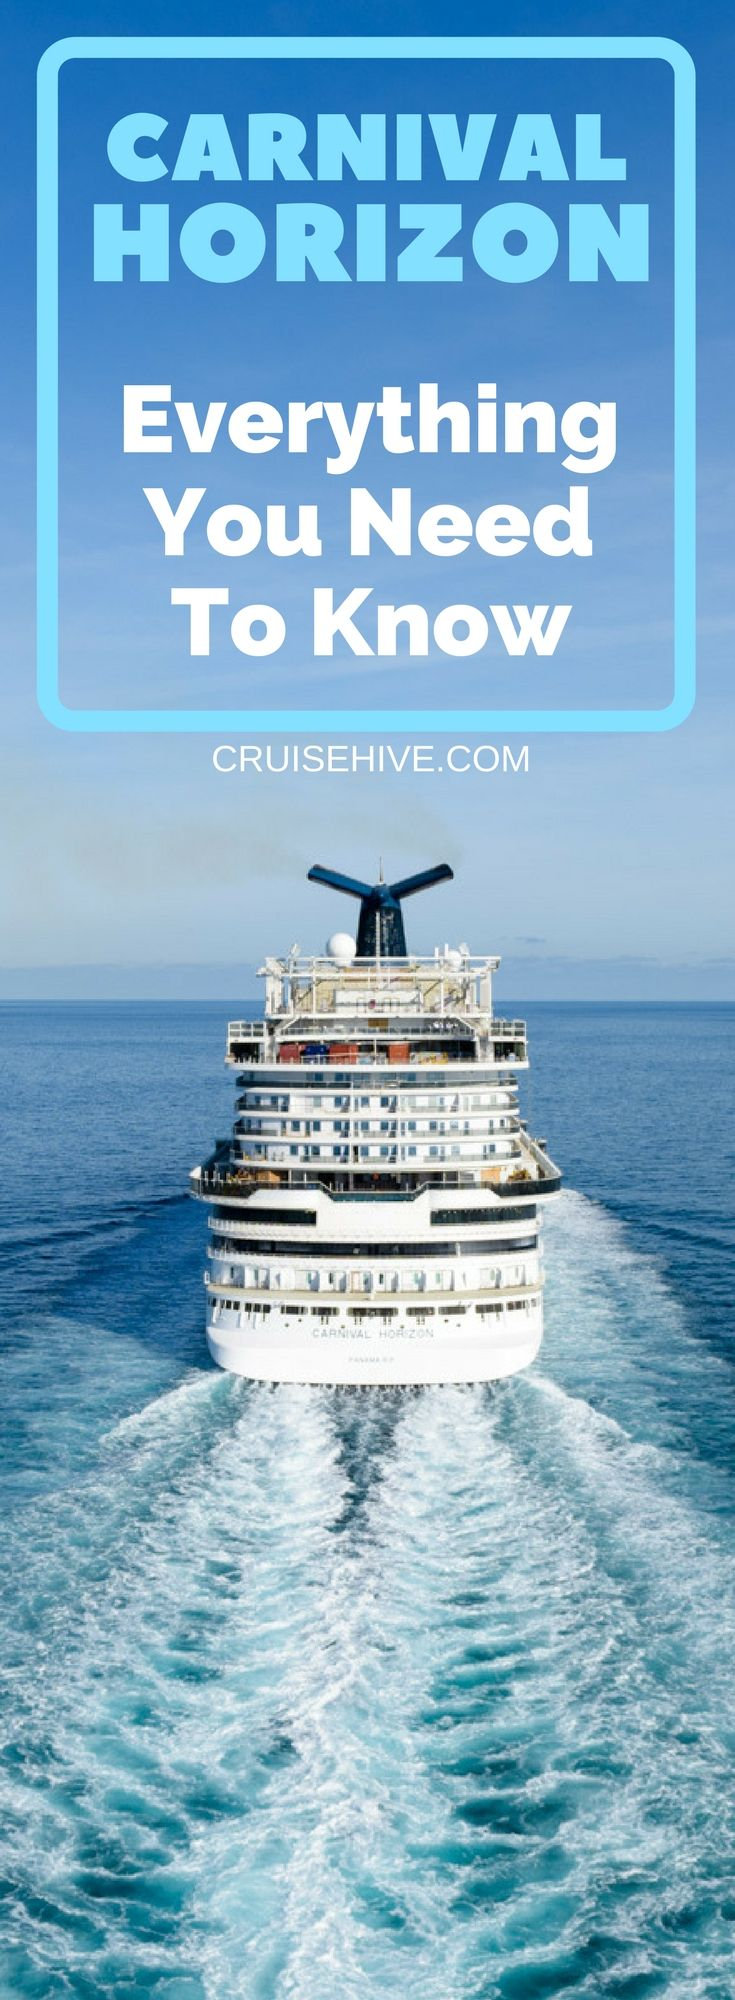 Carnival Cruise Line: Carnival Horizon Cruise Deals, Price